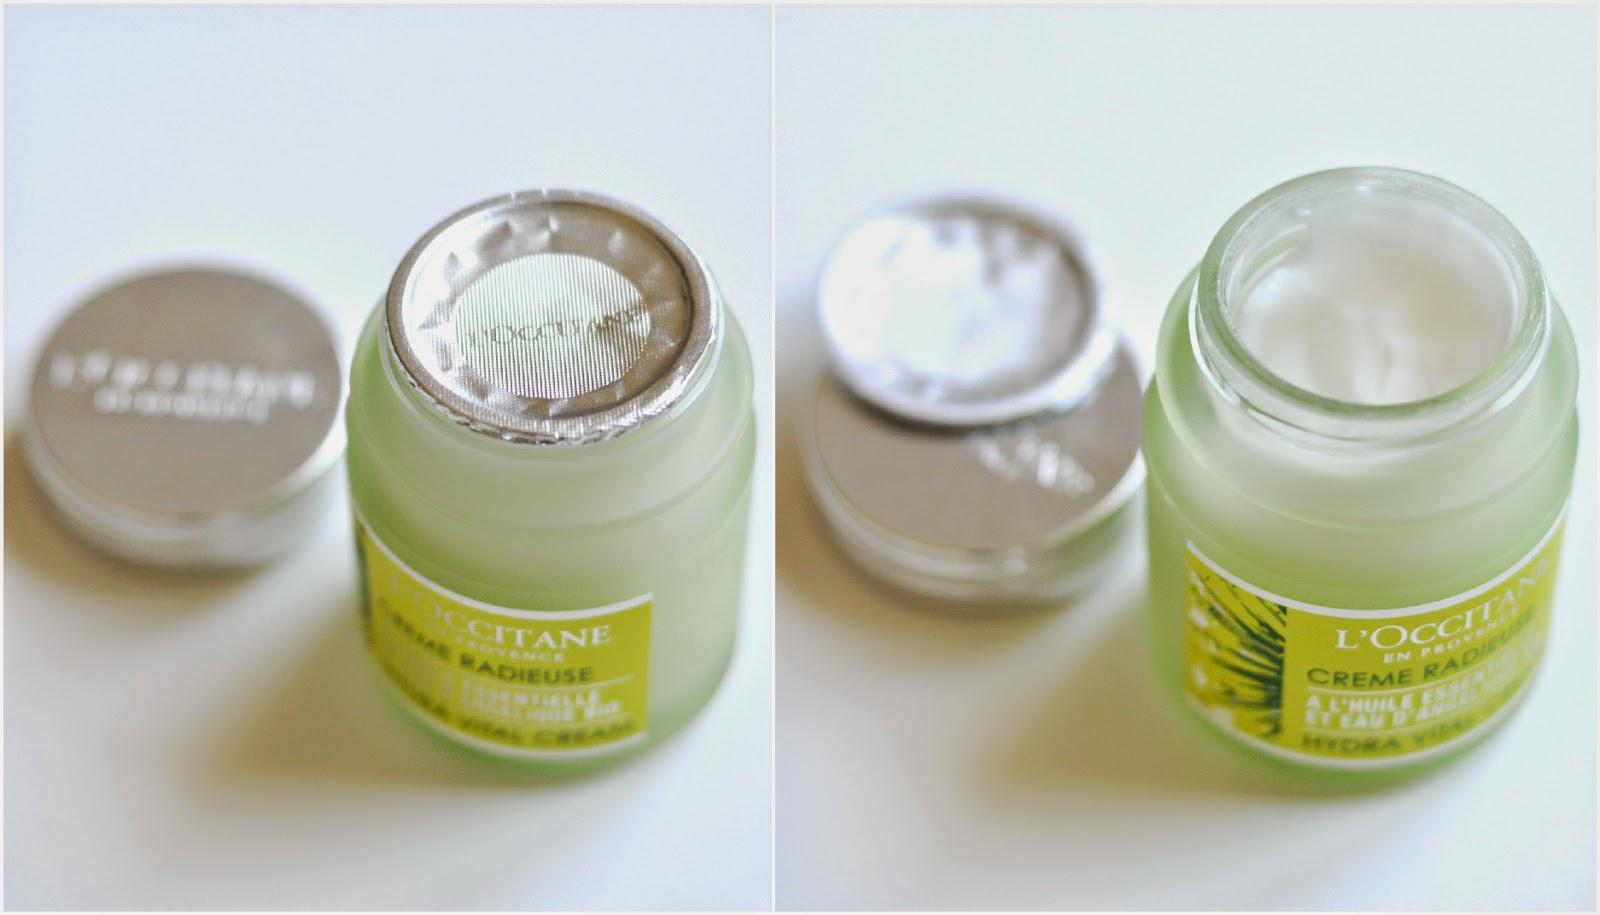 L'Occitane Creme Radieuse Hydra Vital Cream